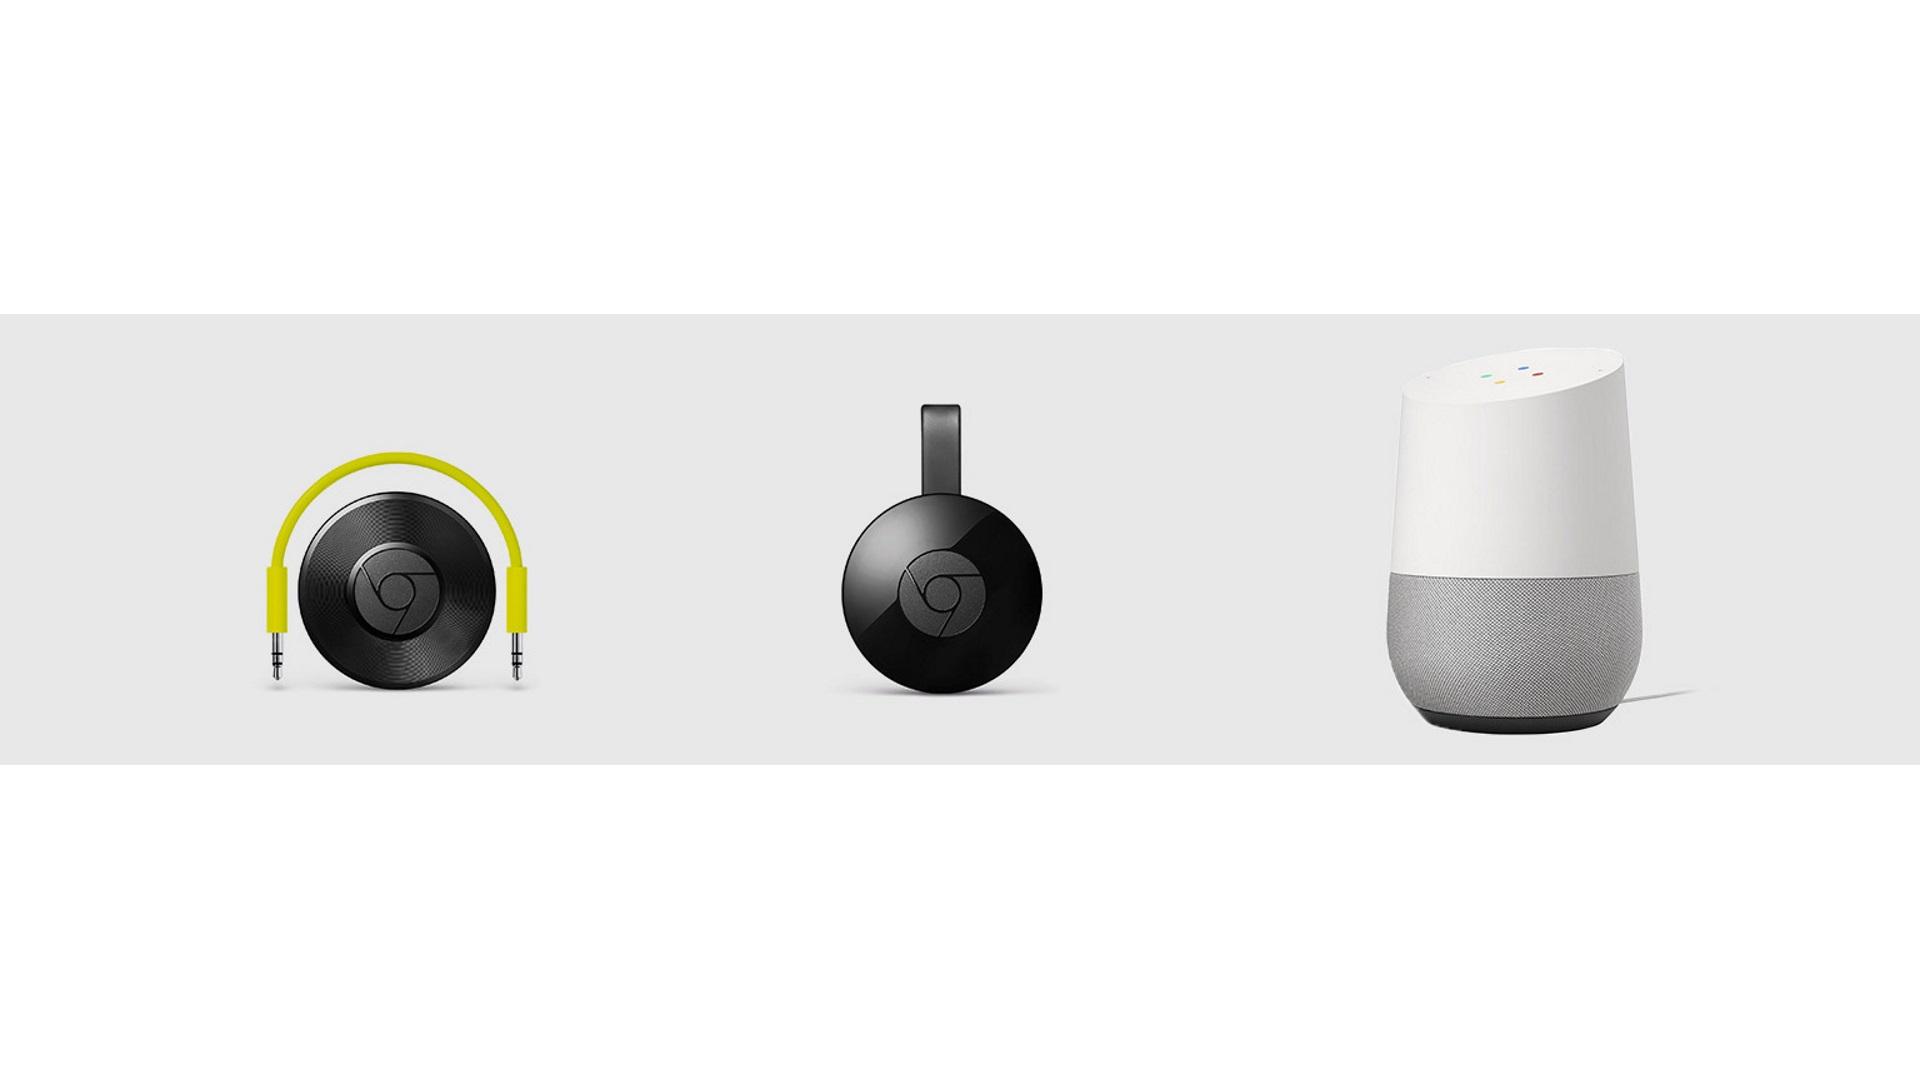 ebayでGoogle公式ストアを発見、今後活用できるかも【レポート】